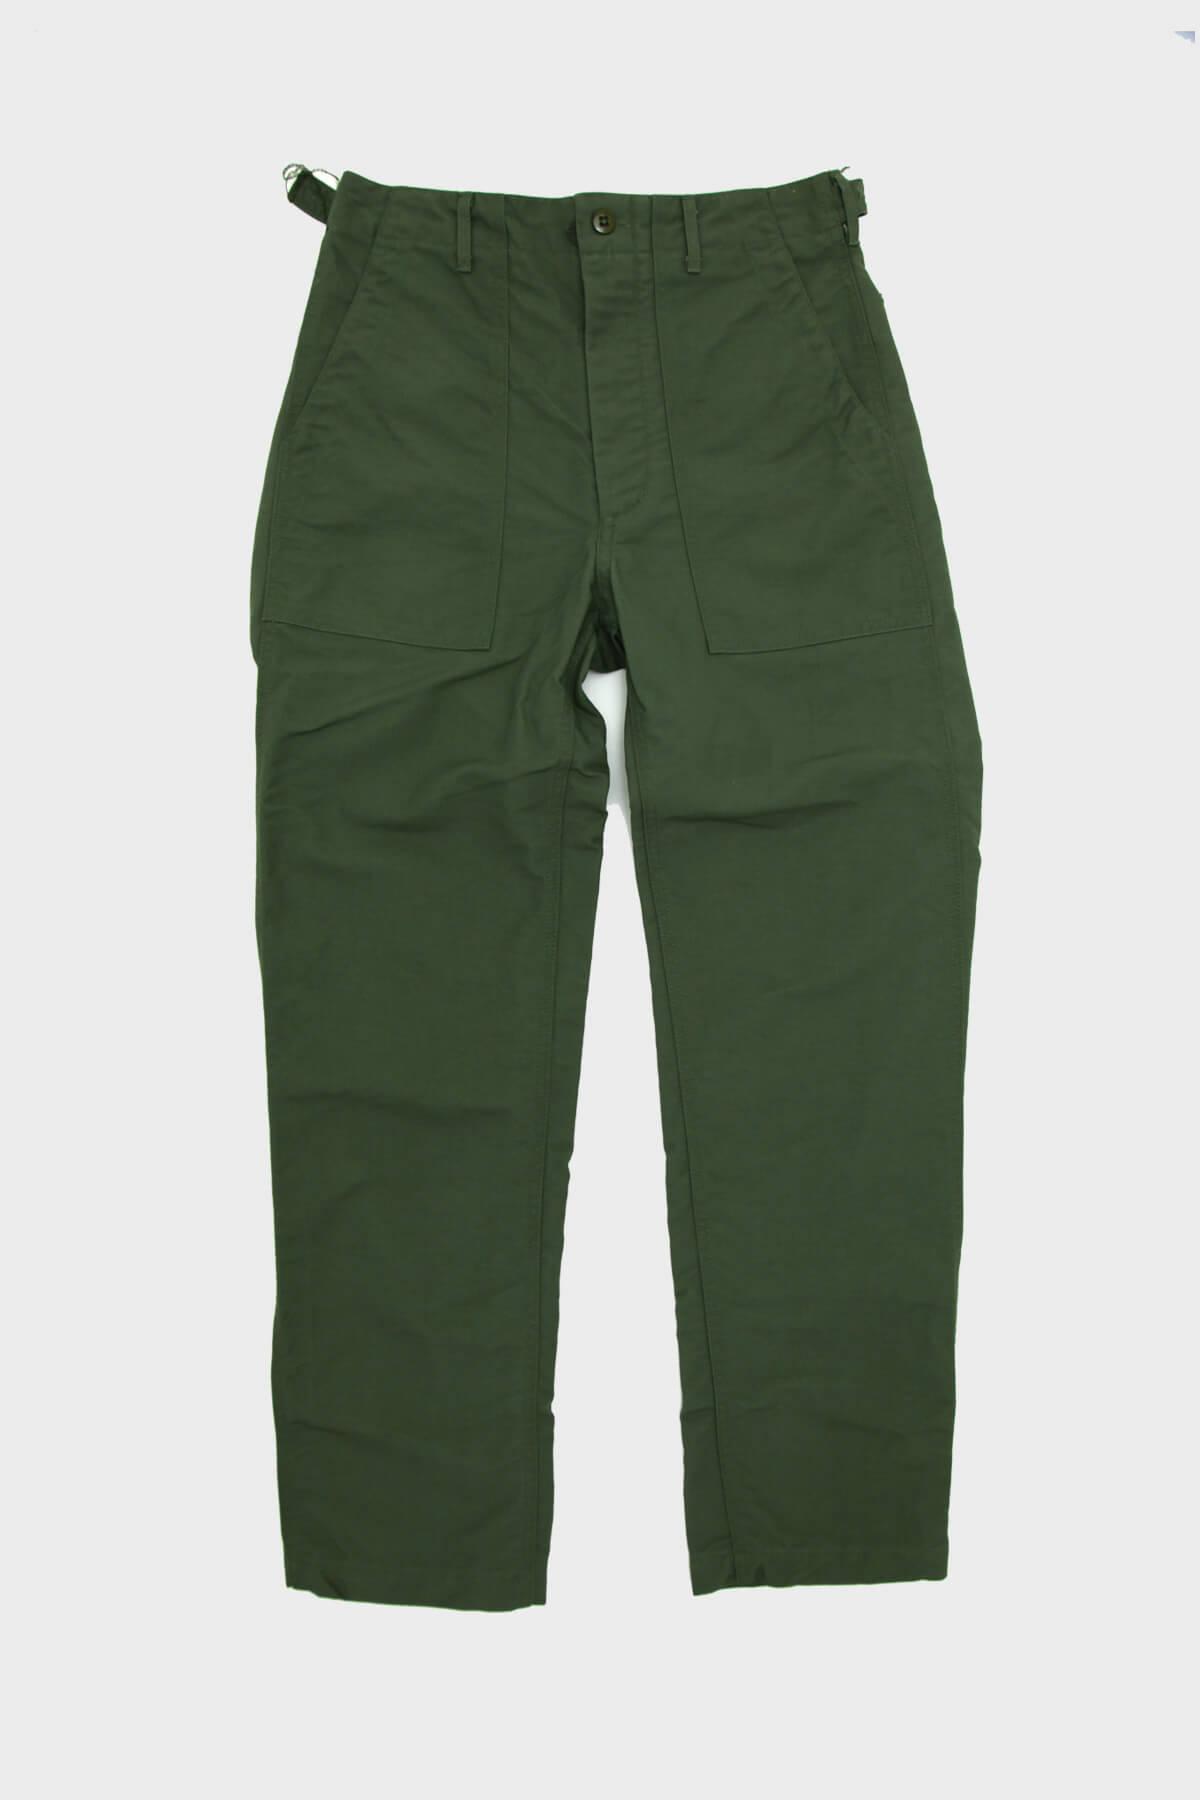 engineered garments fatigue pants